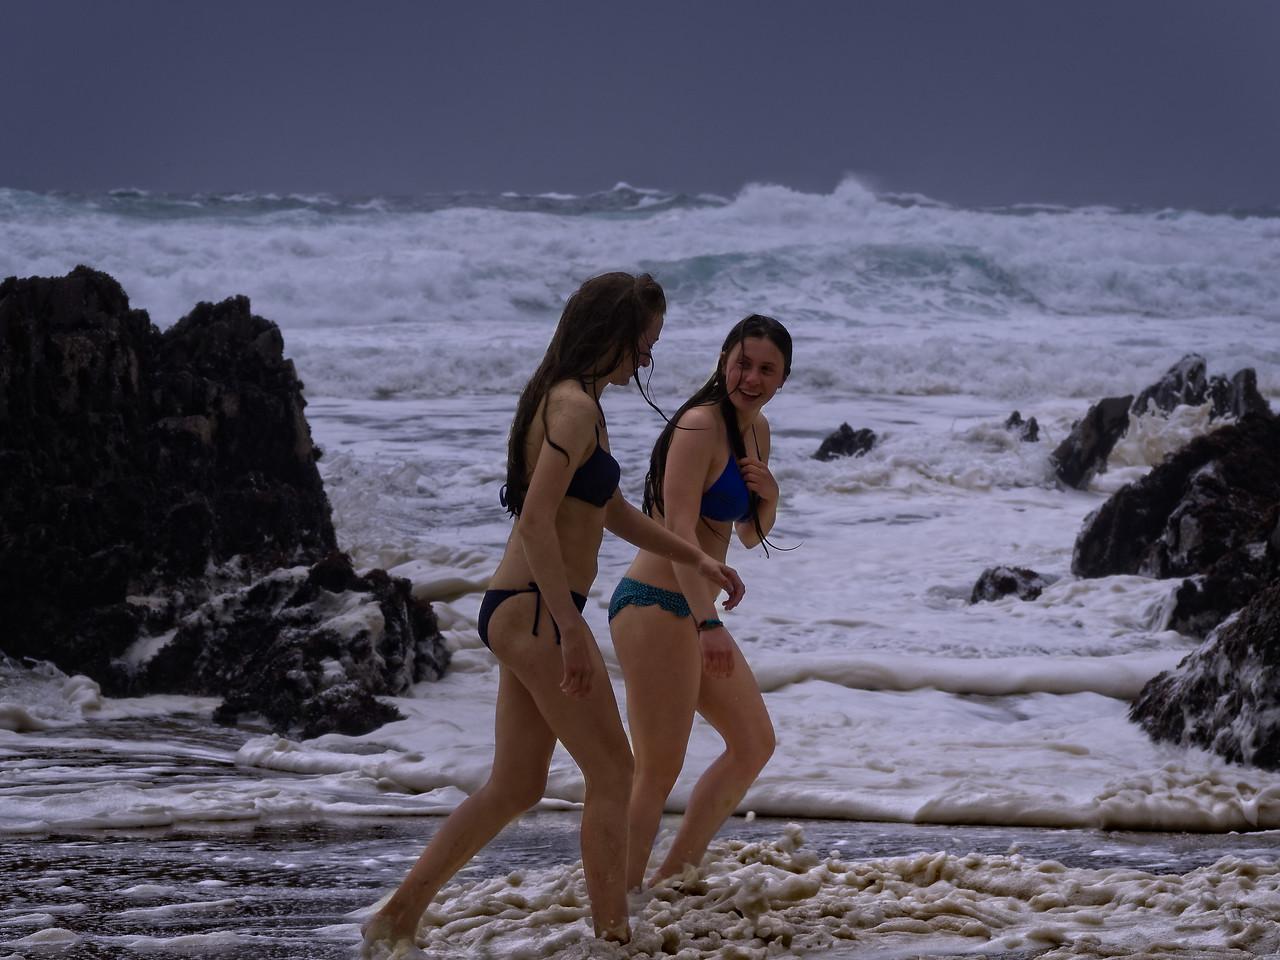 Bikini time on a Dingle Beach  on a windy wild day